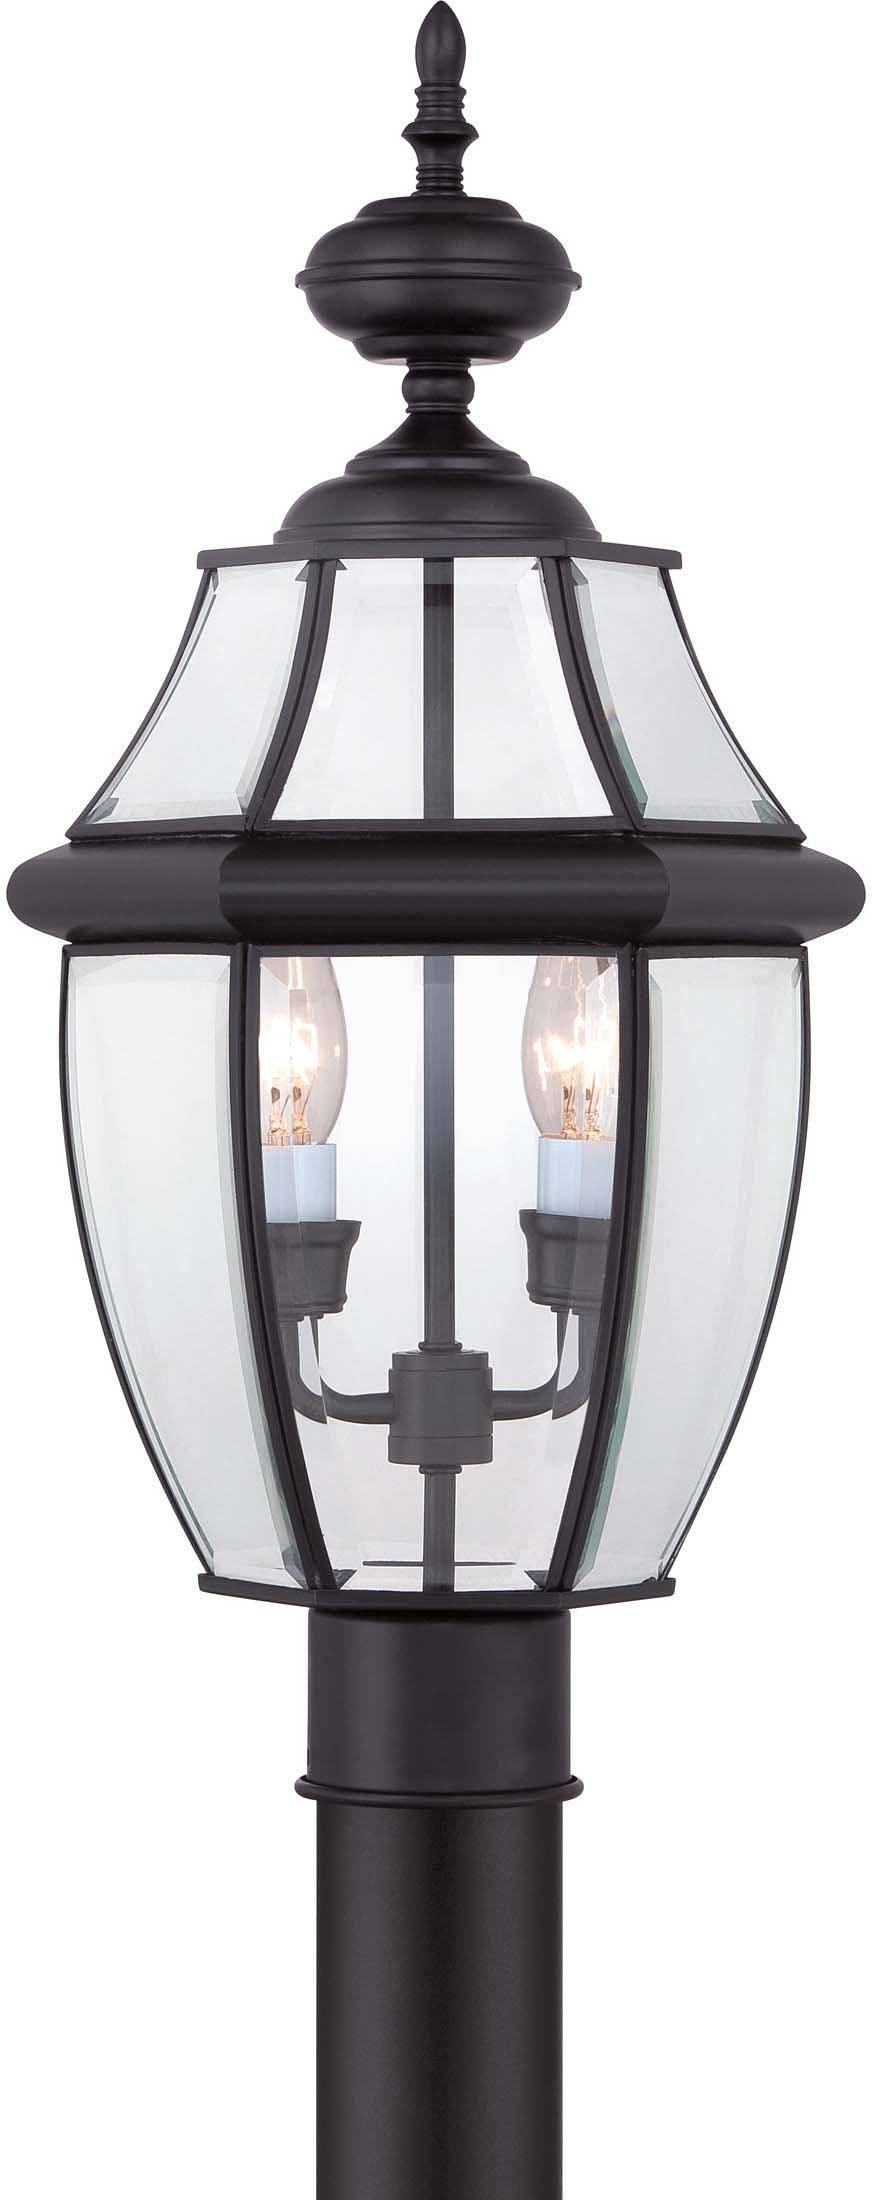 Quoizel NY9042K Newbury 2-Light Outdoor Post Lantern, Mystic Black by Quoizel